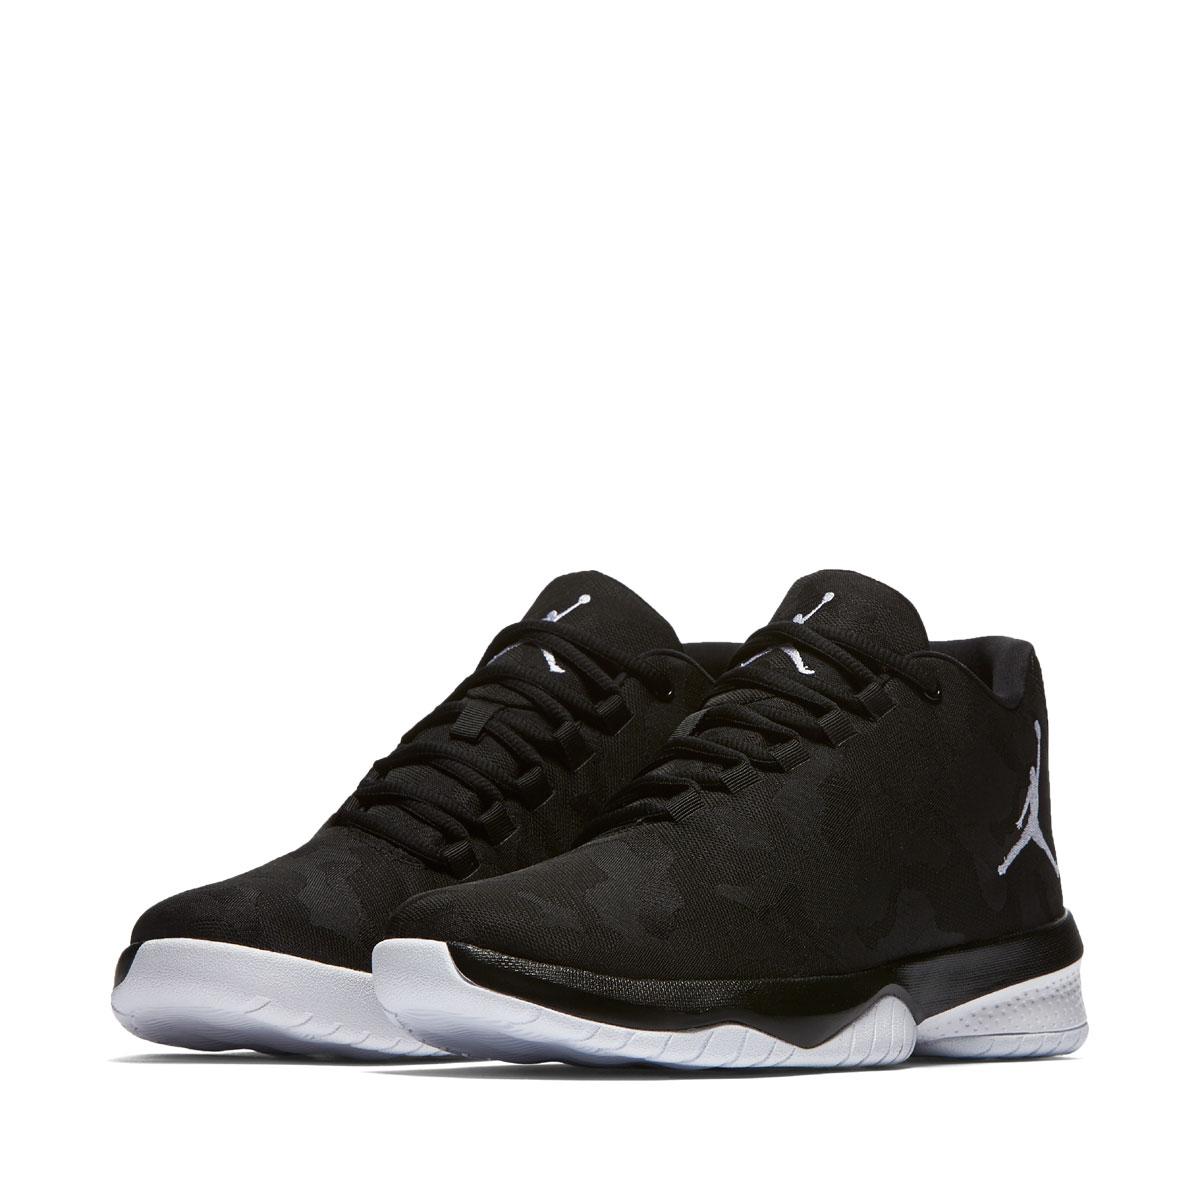 47074c2f5f236 atmos pink  NIKE JORDAN B. FLY (Nike Jordan B.FLY) (BLACK WHITE ...